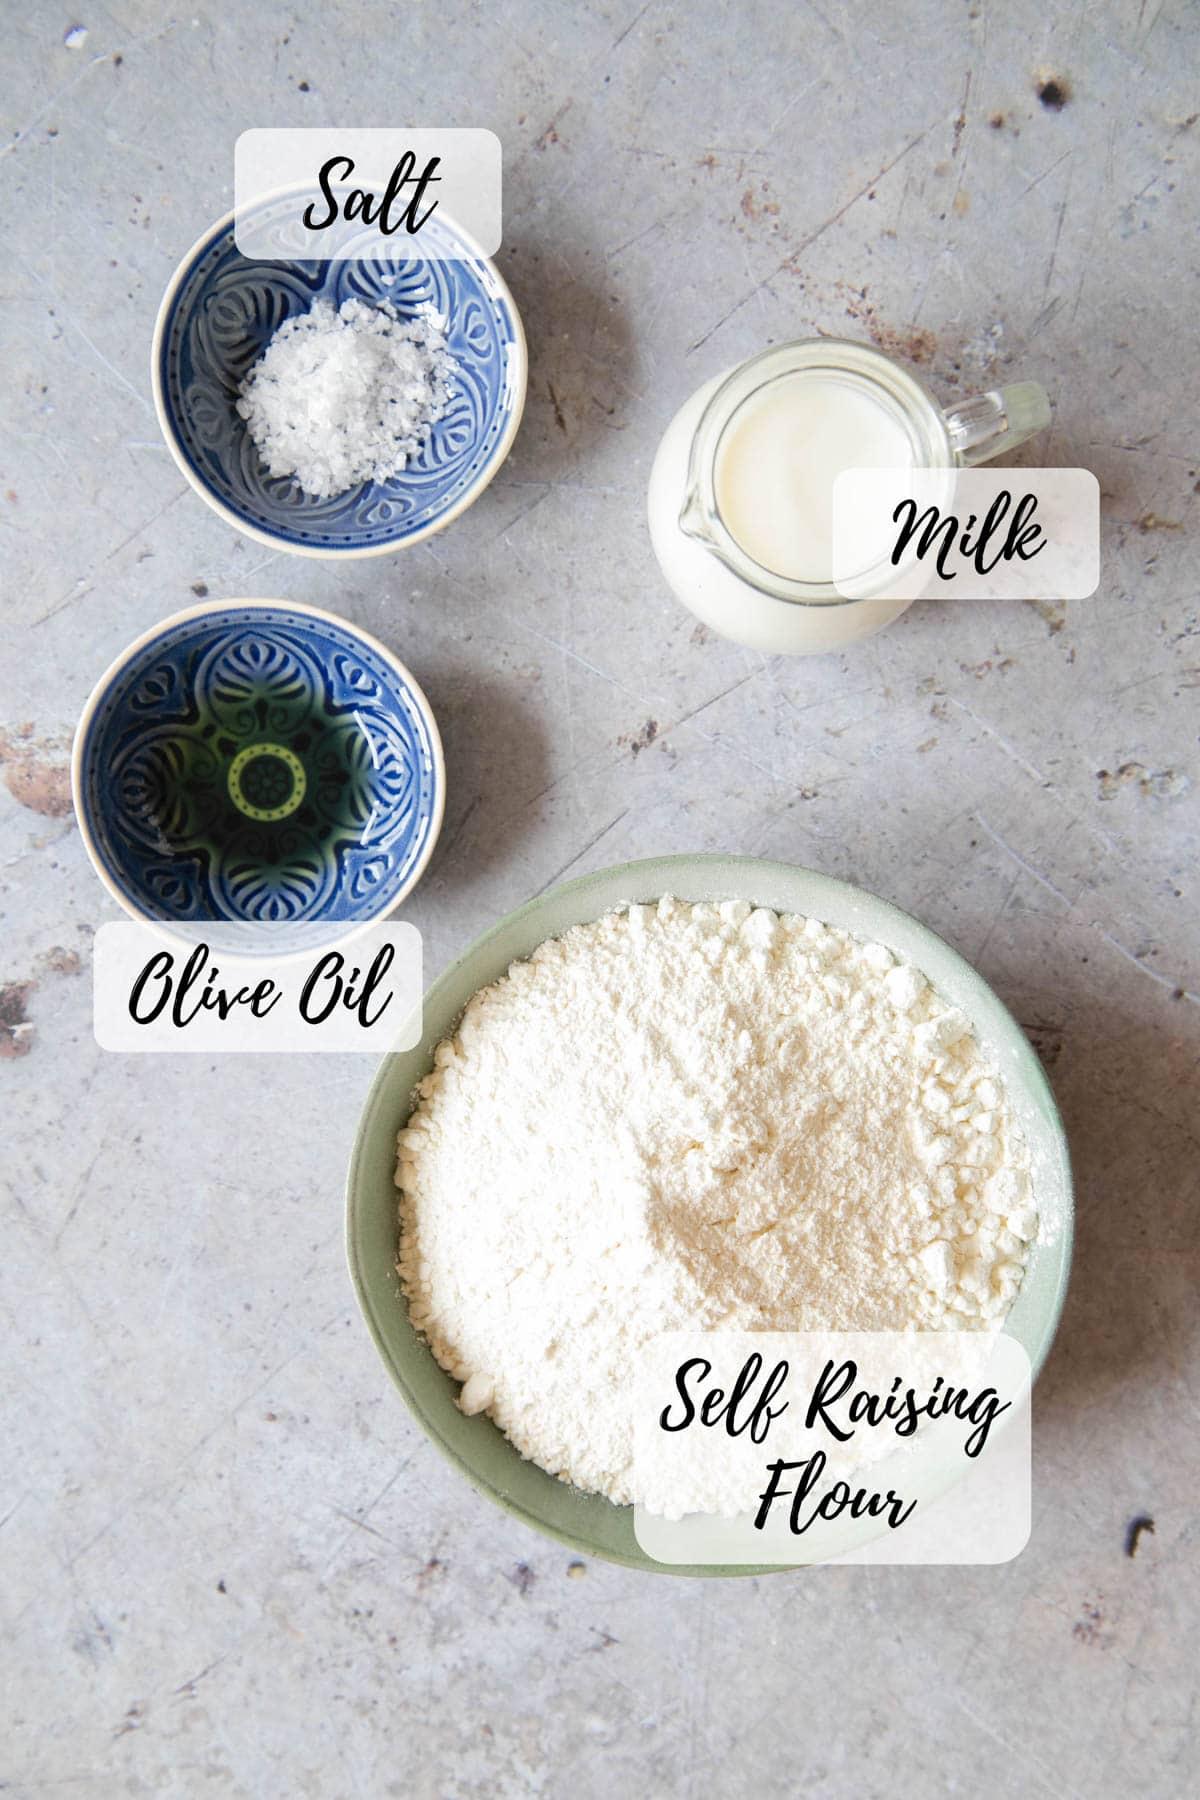 Ingredients for self raising flour bread - white self raising flour, salt, milk, and olive oil.